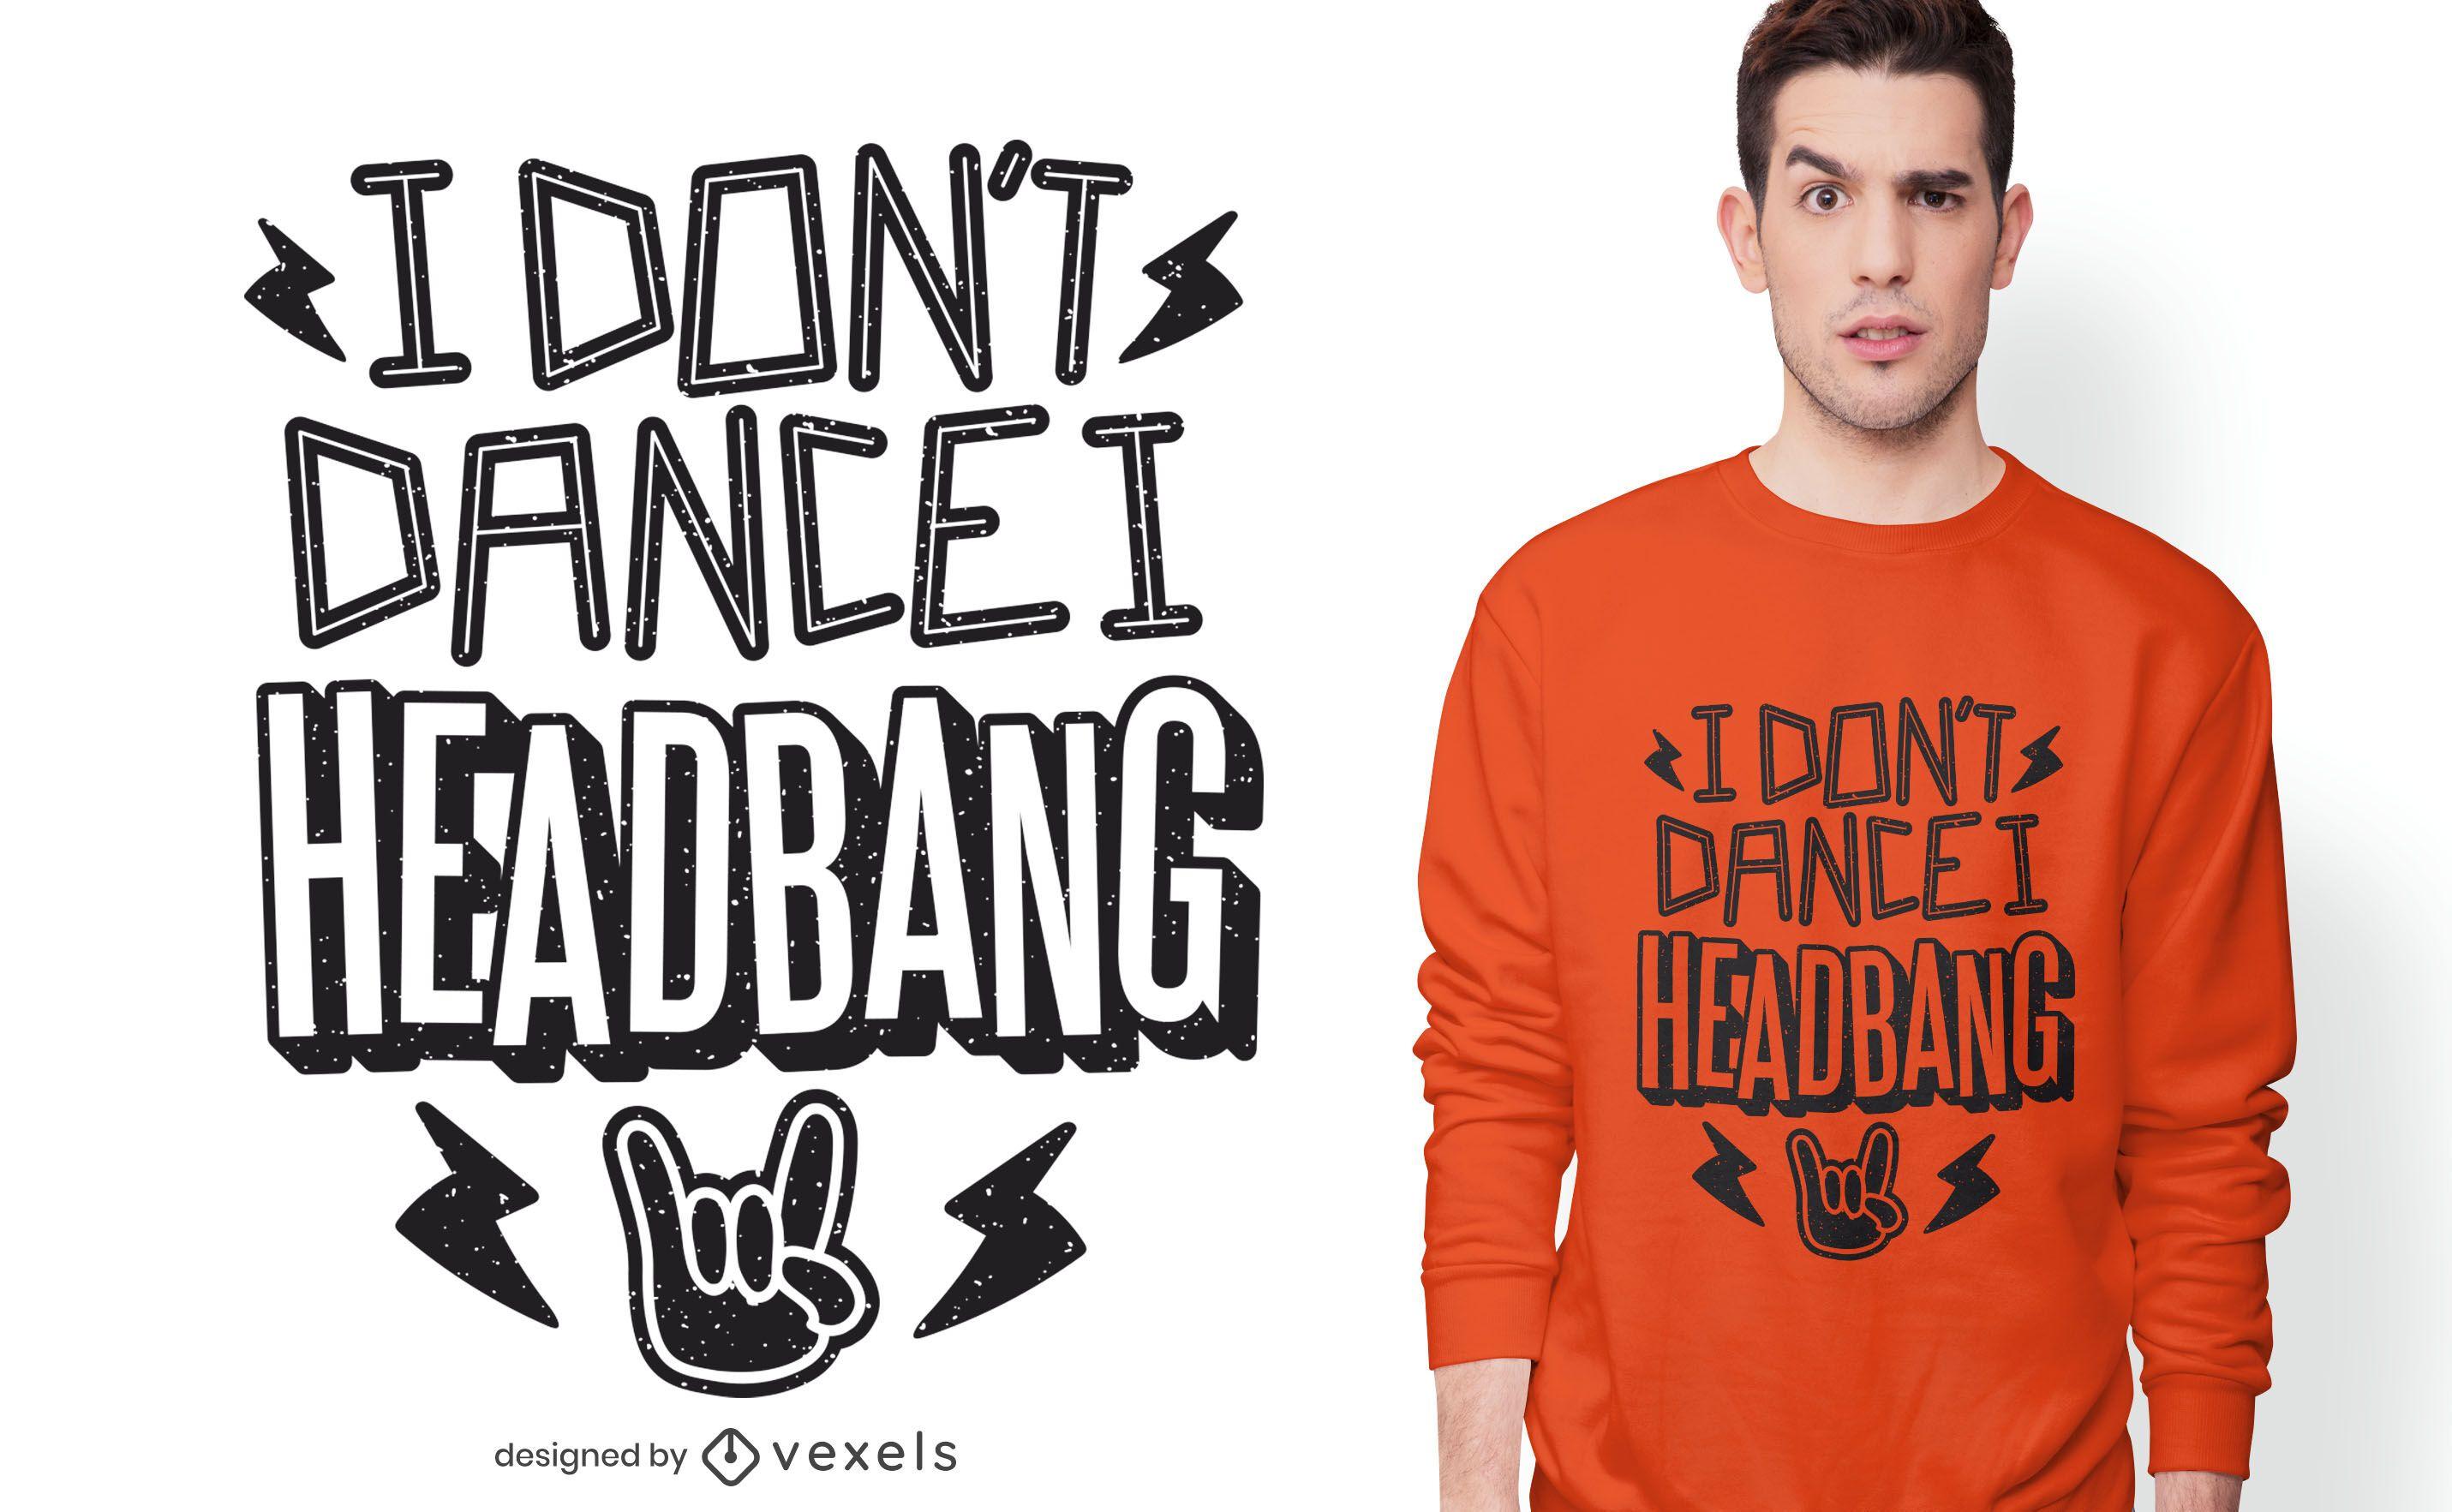 I headbang t-shirt design